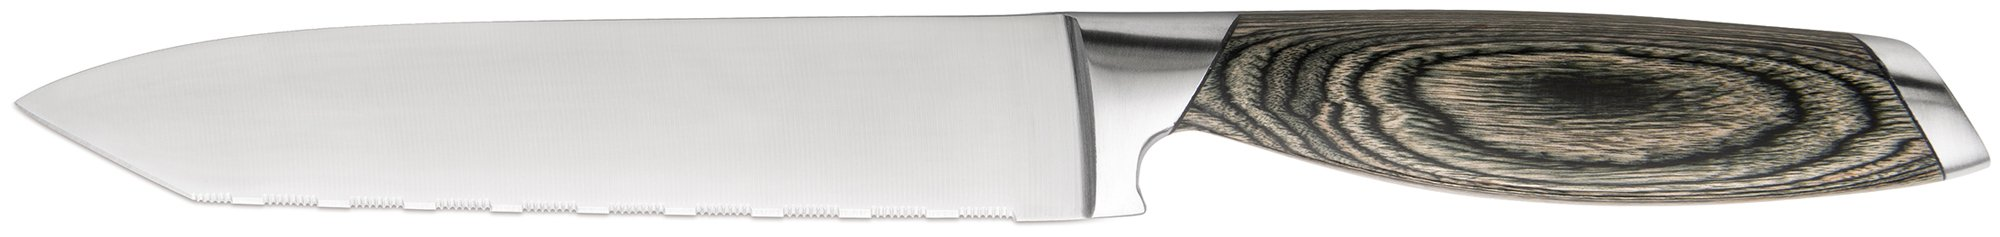 Schmidt Bros. Cutlery Bonded Ash 5'' Utility Knife by Schmidt Bros. (Image #1)